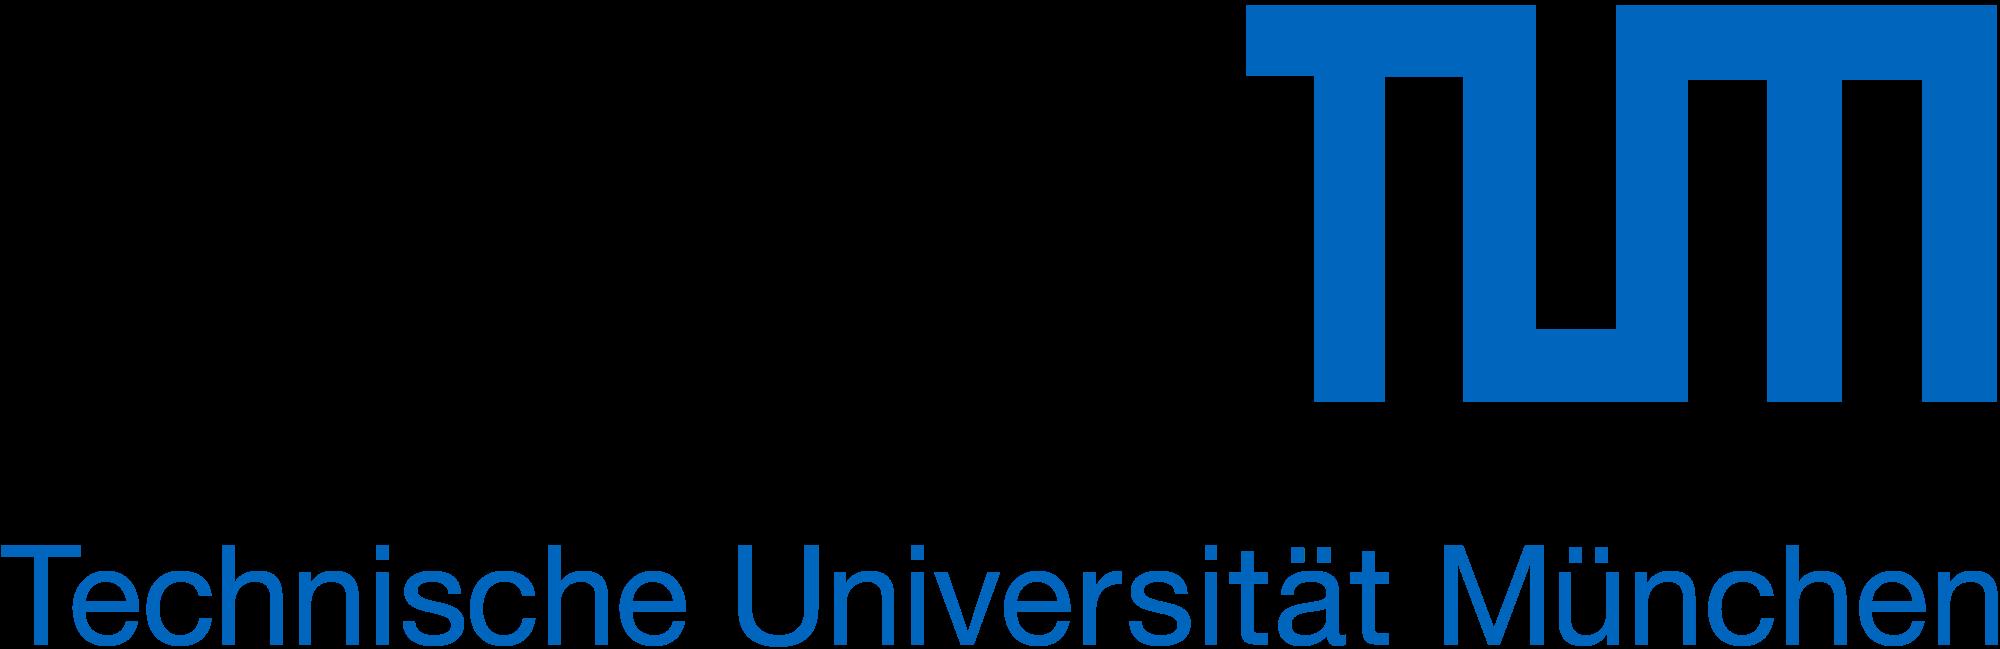 TU München Logo